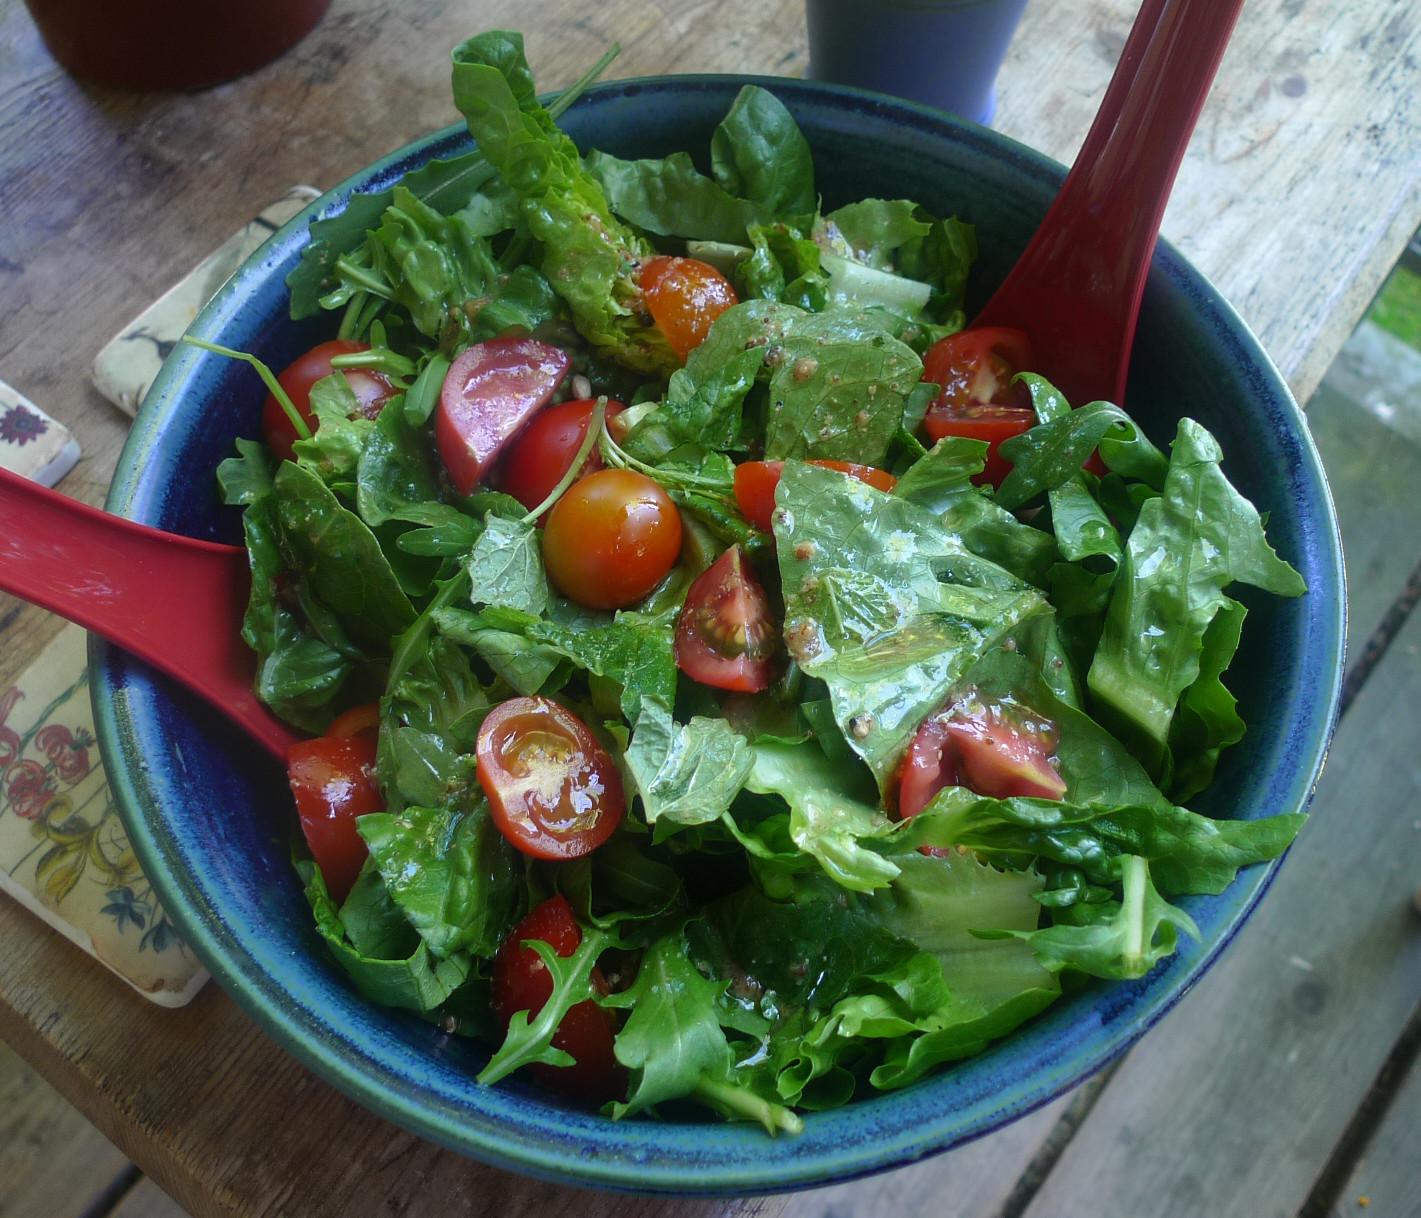 Lachs,Spargel,Dip,Salat,Kartoffel -10.5.15   (6)